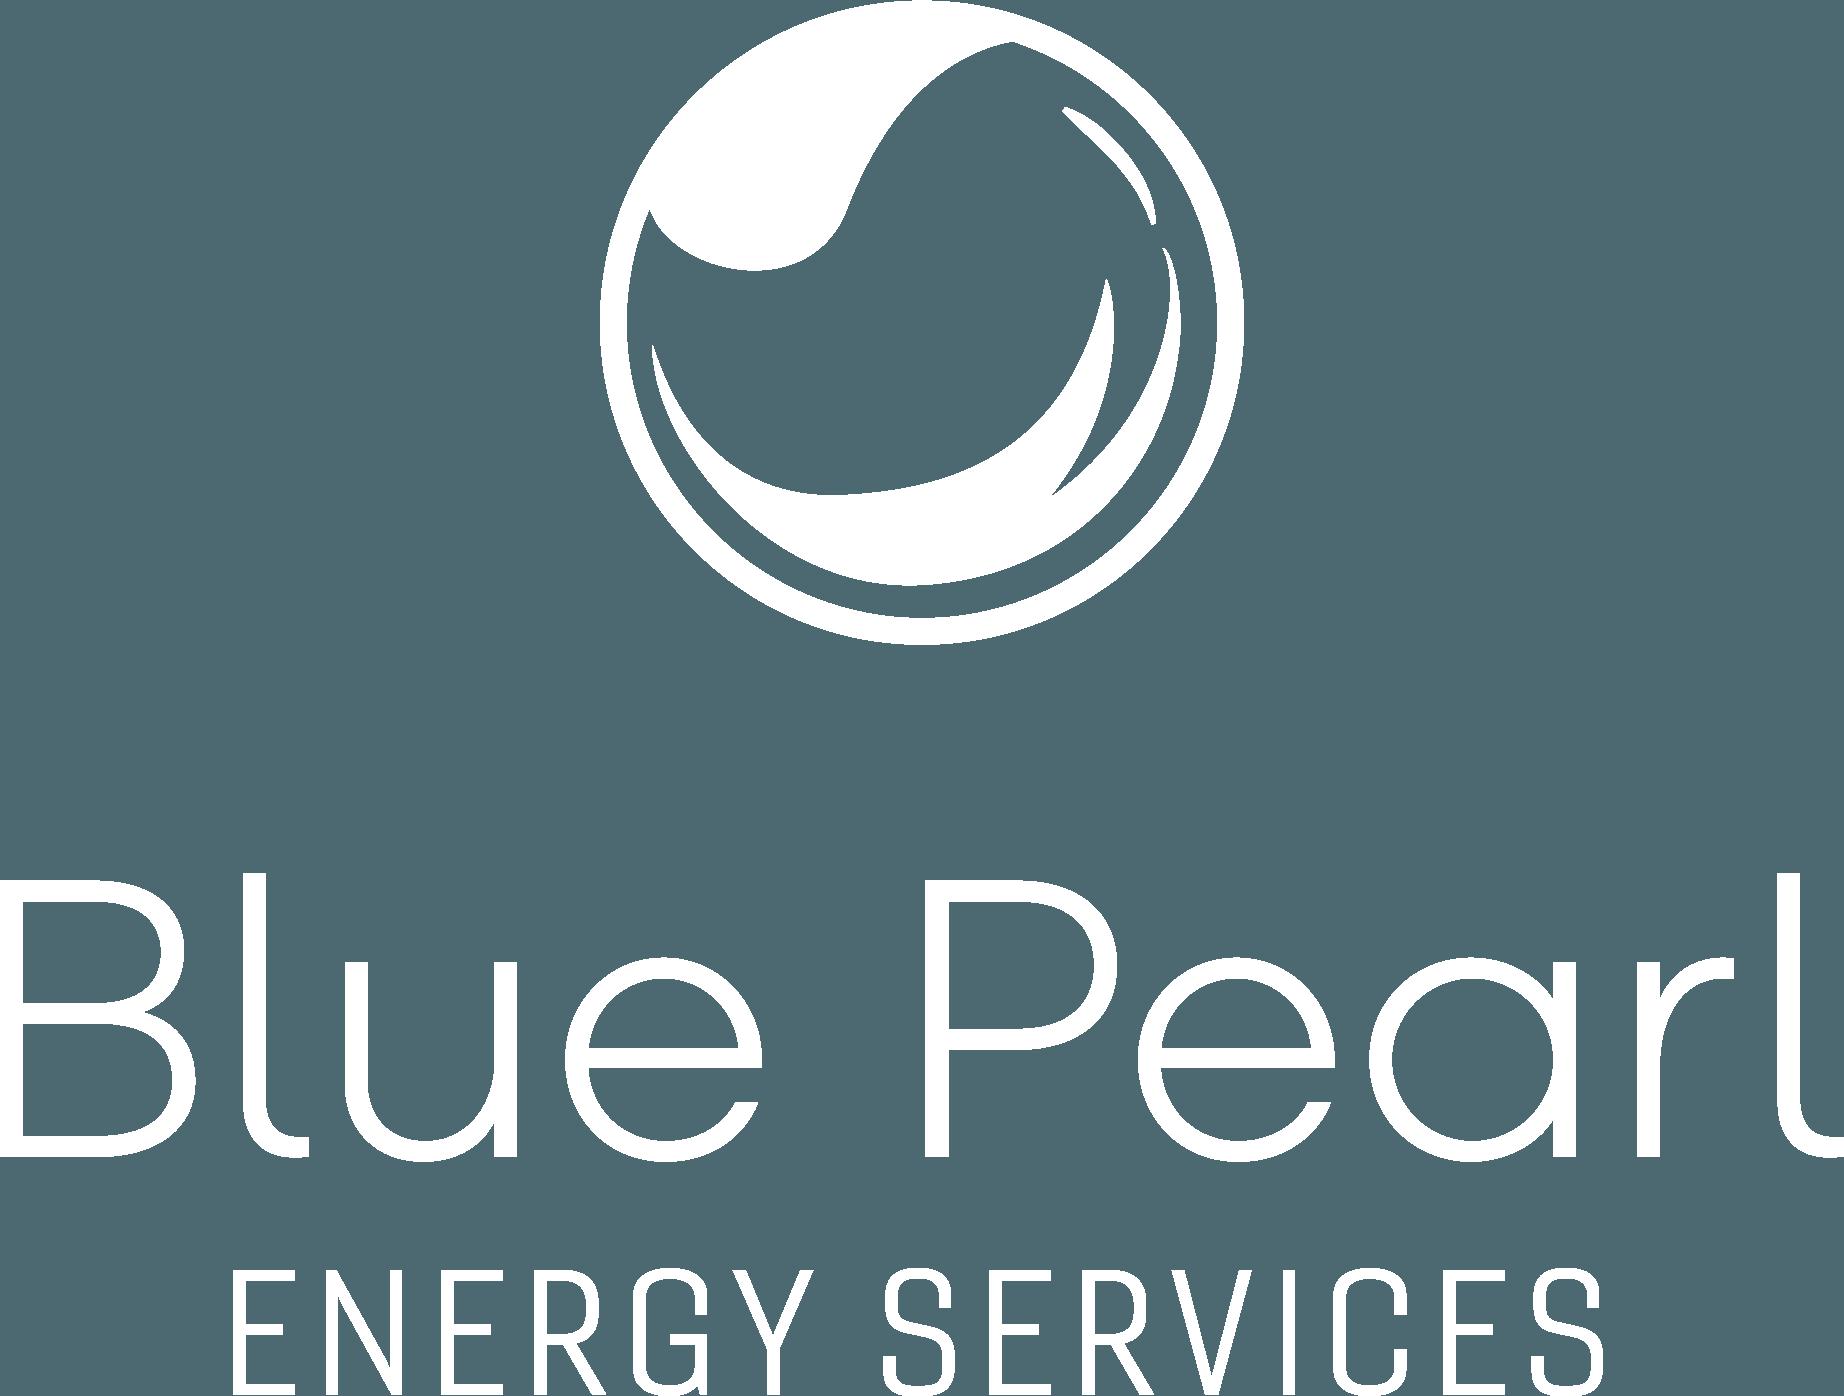 Blue Pearl Energy